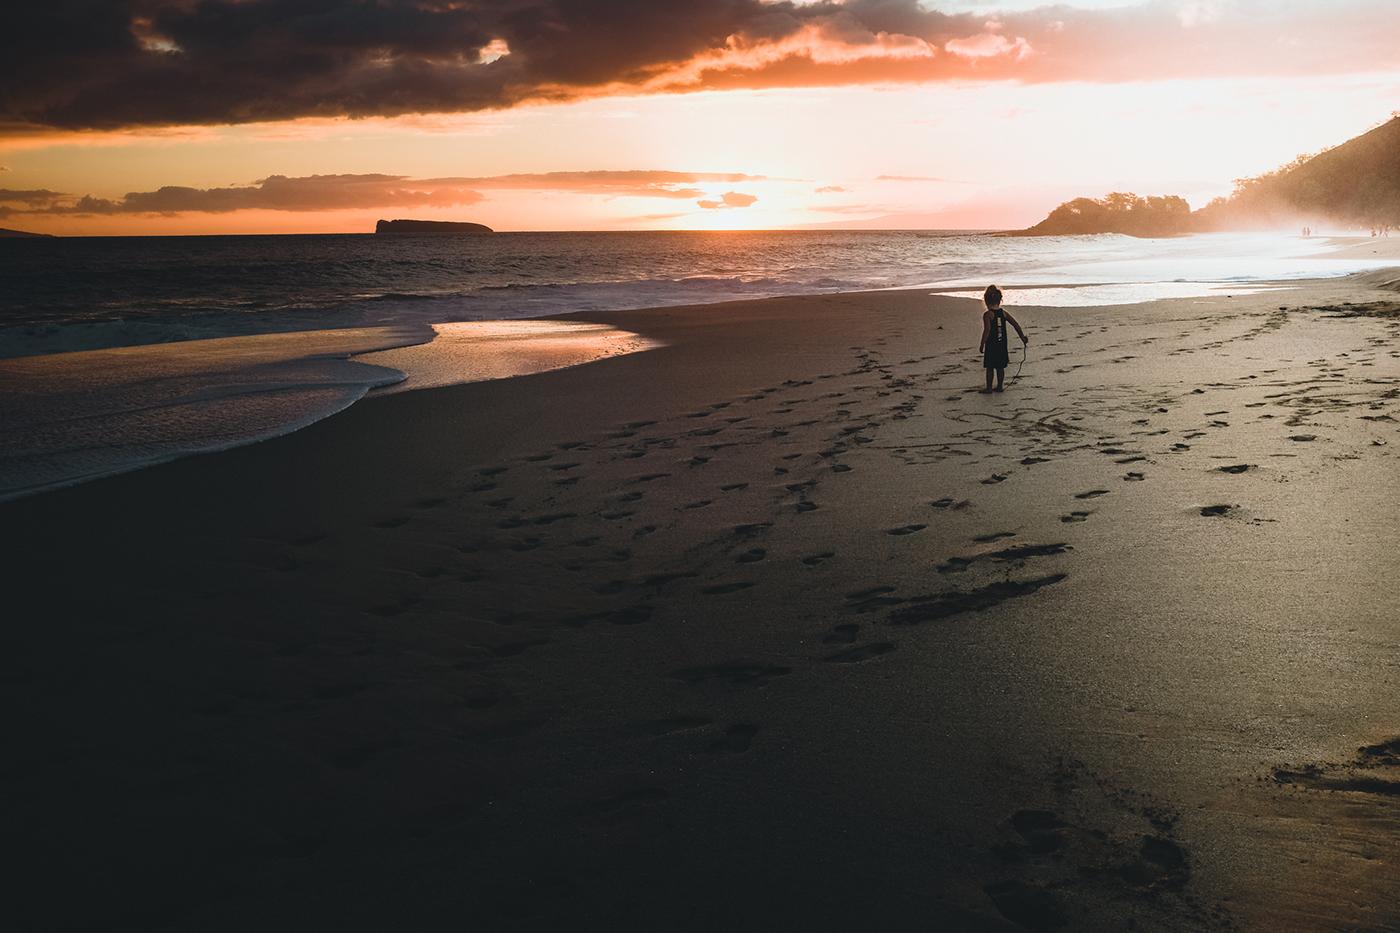 angie goes exploring honeymoon in 2½ itinerario di un mese in alaska e alle hawaii giorgia romiti maui four seasons